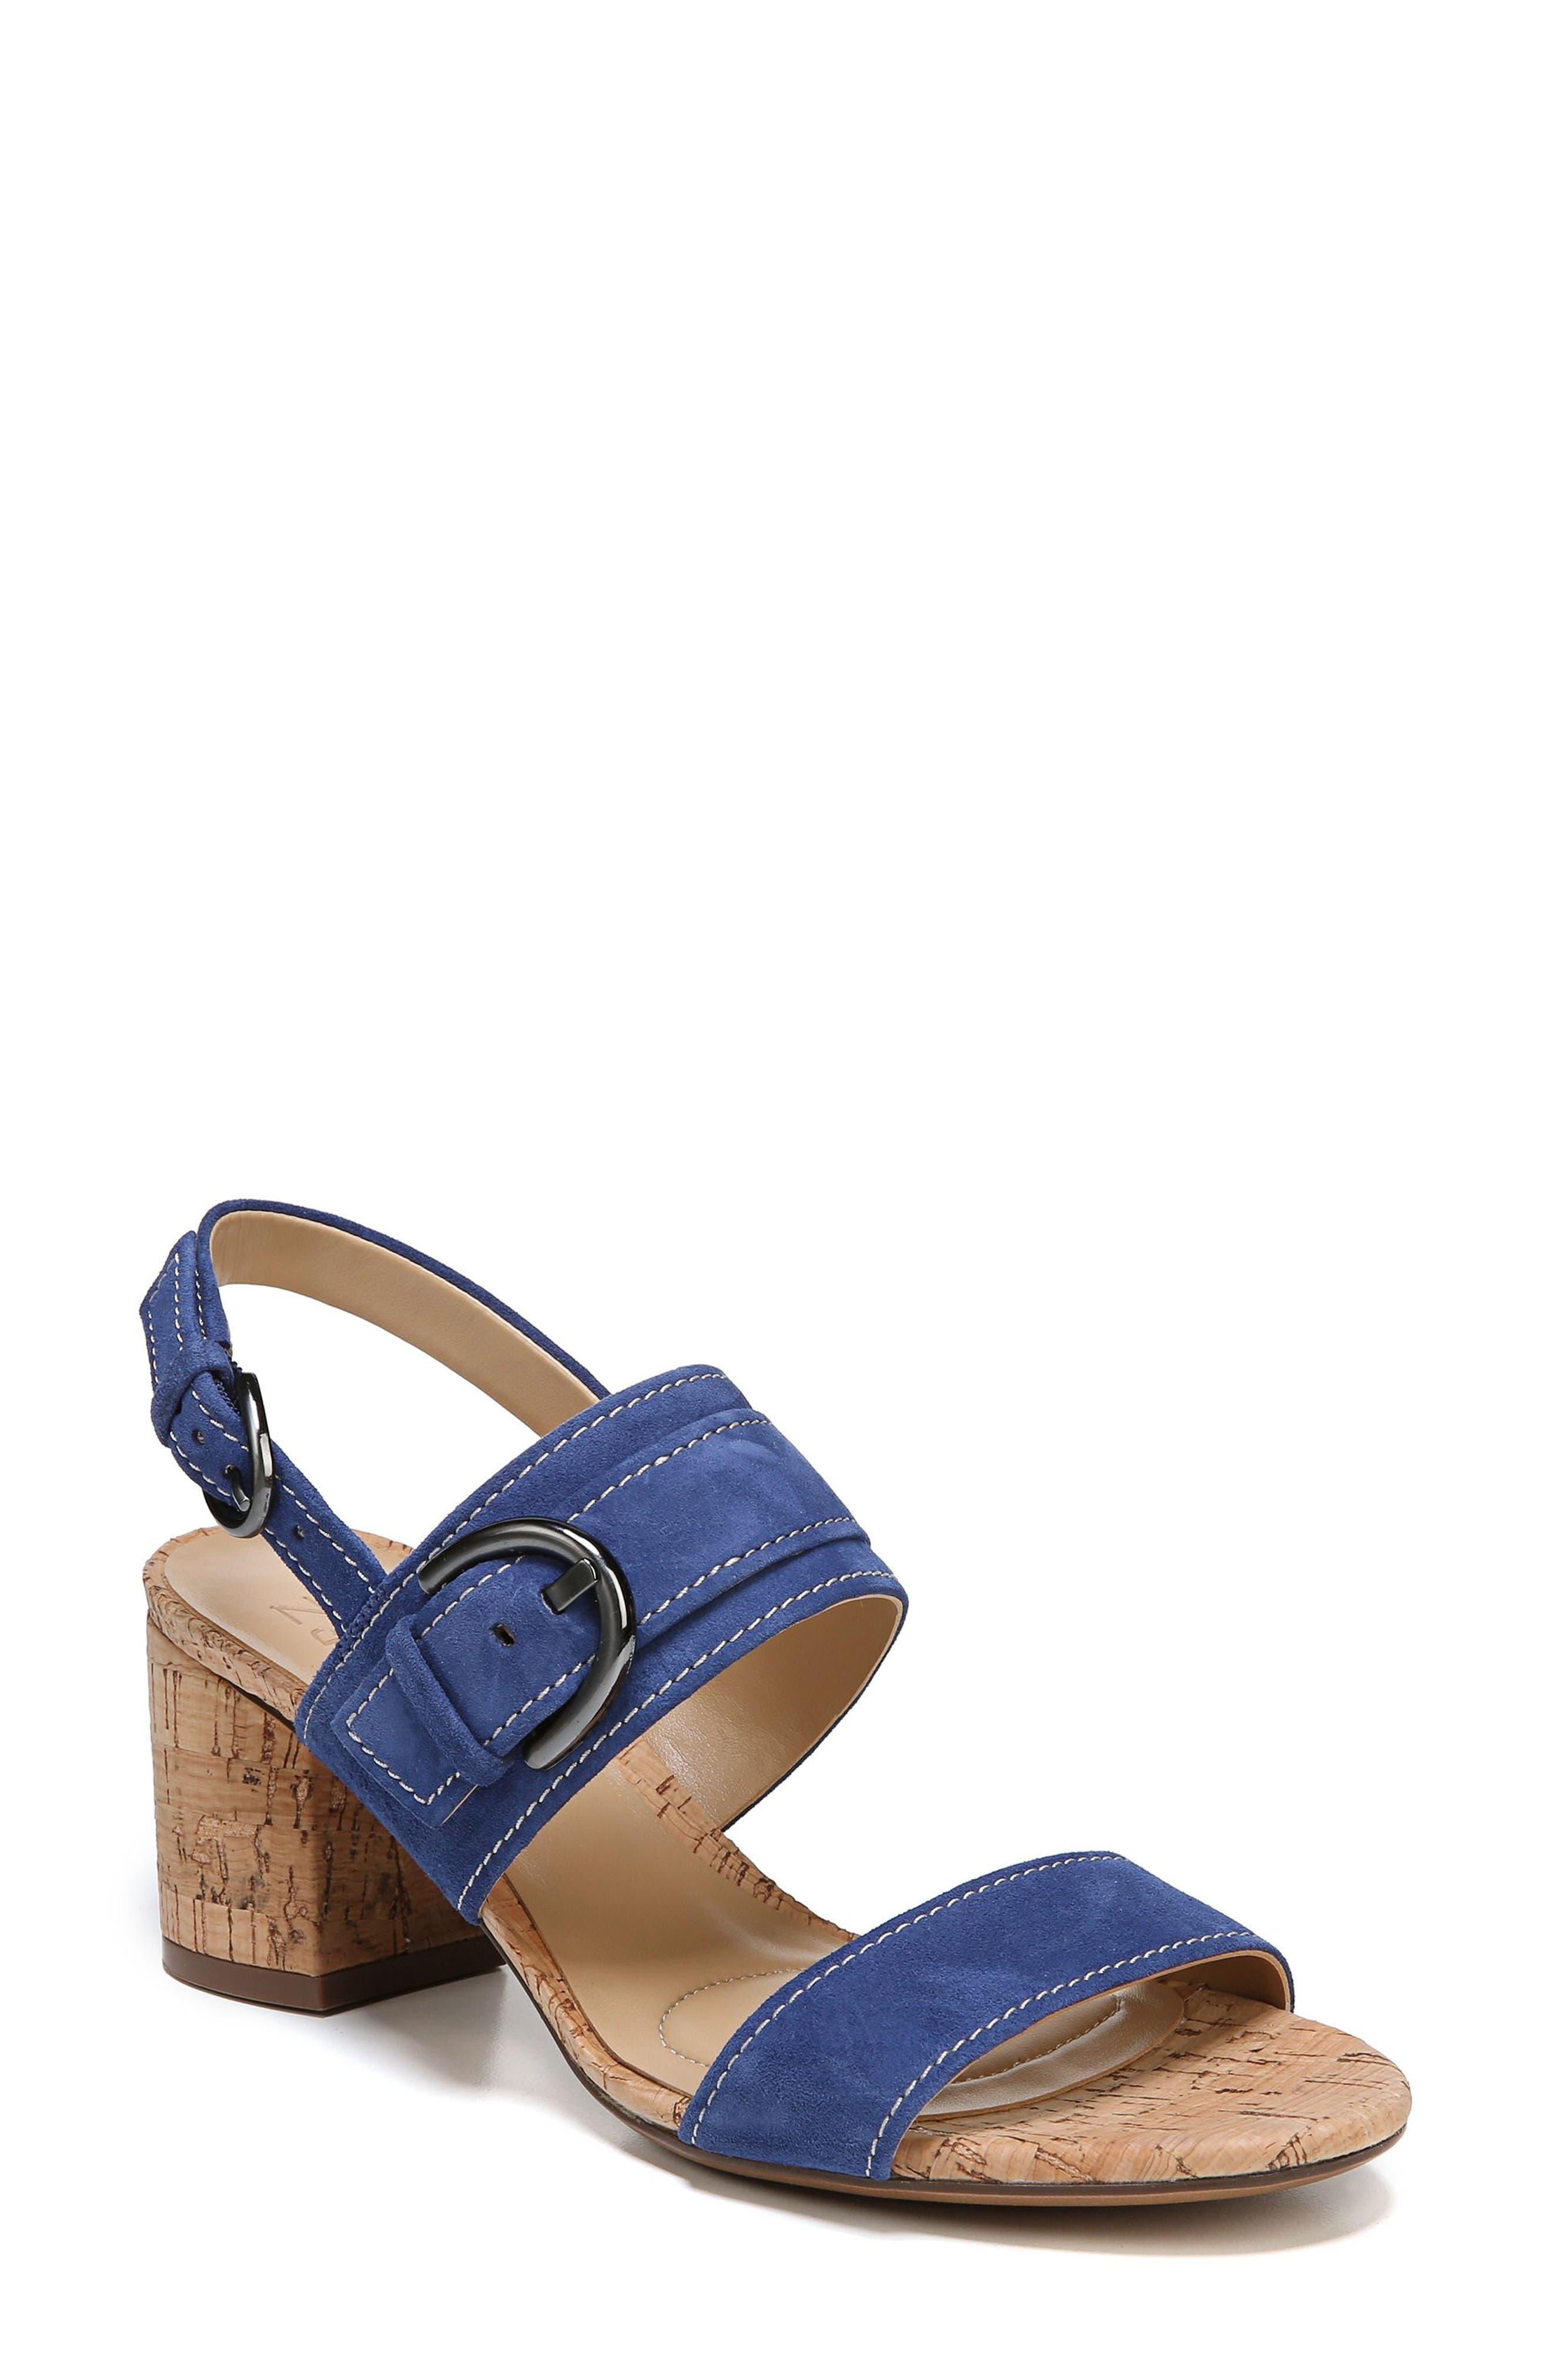 Camden Sandal,                         Main,                         color, Blue Suede